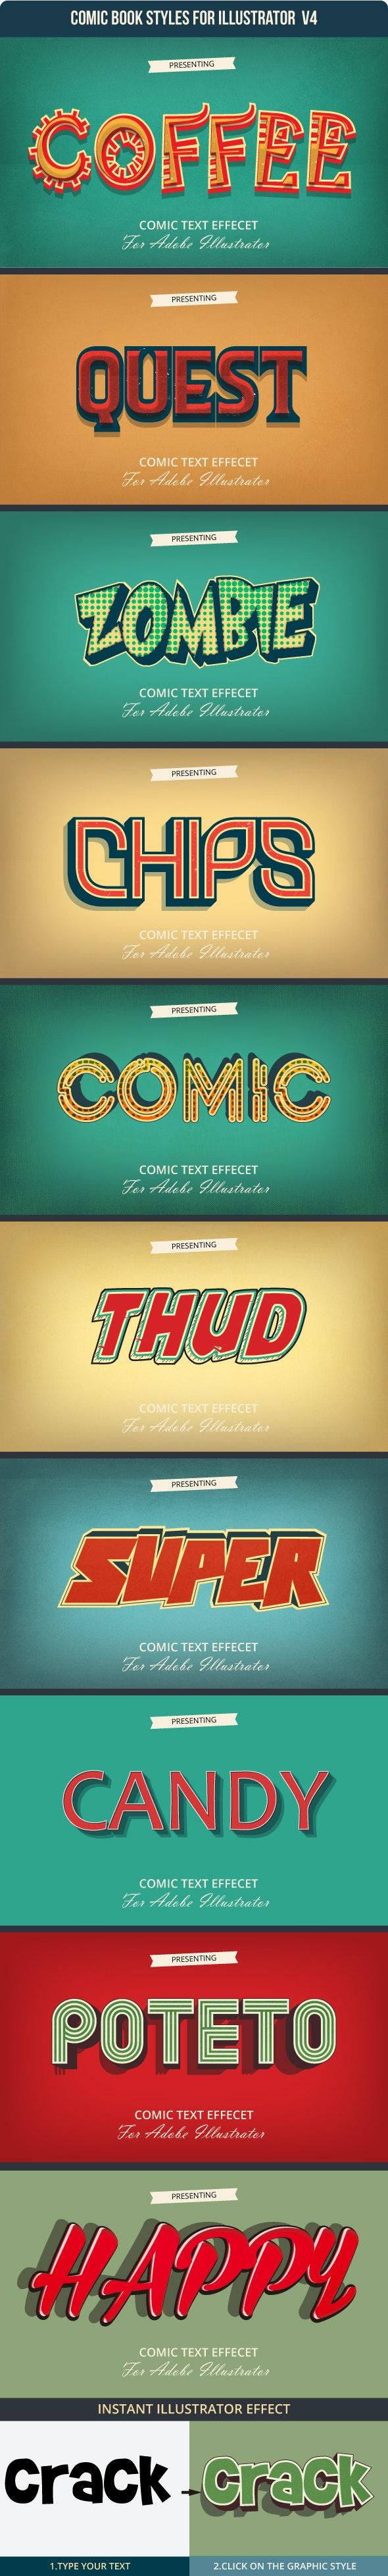 Game & Comic Text Effect for Adobe Illustrator - Styles Illustrator